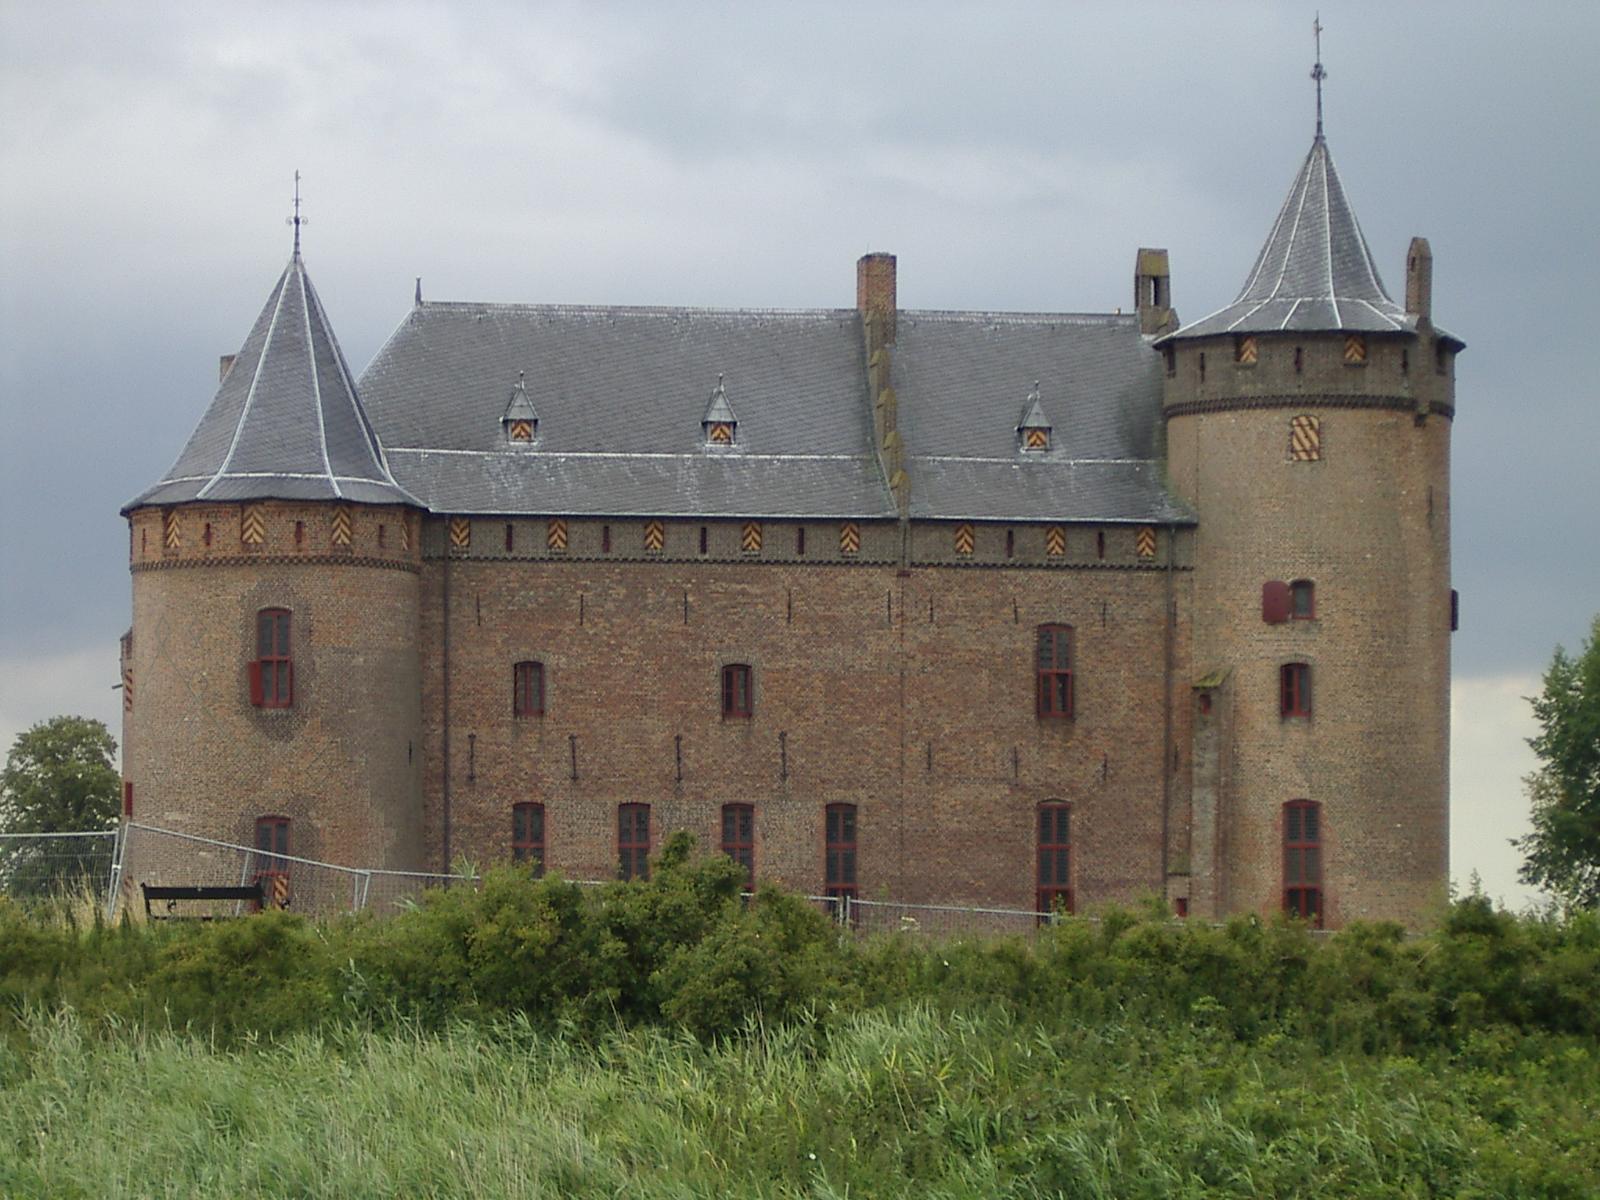 diederik castle fortification medieval